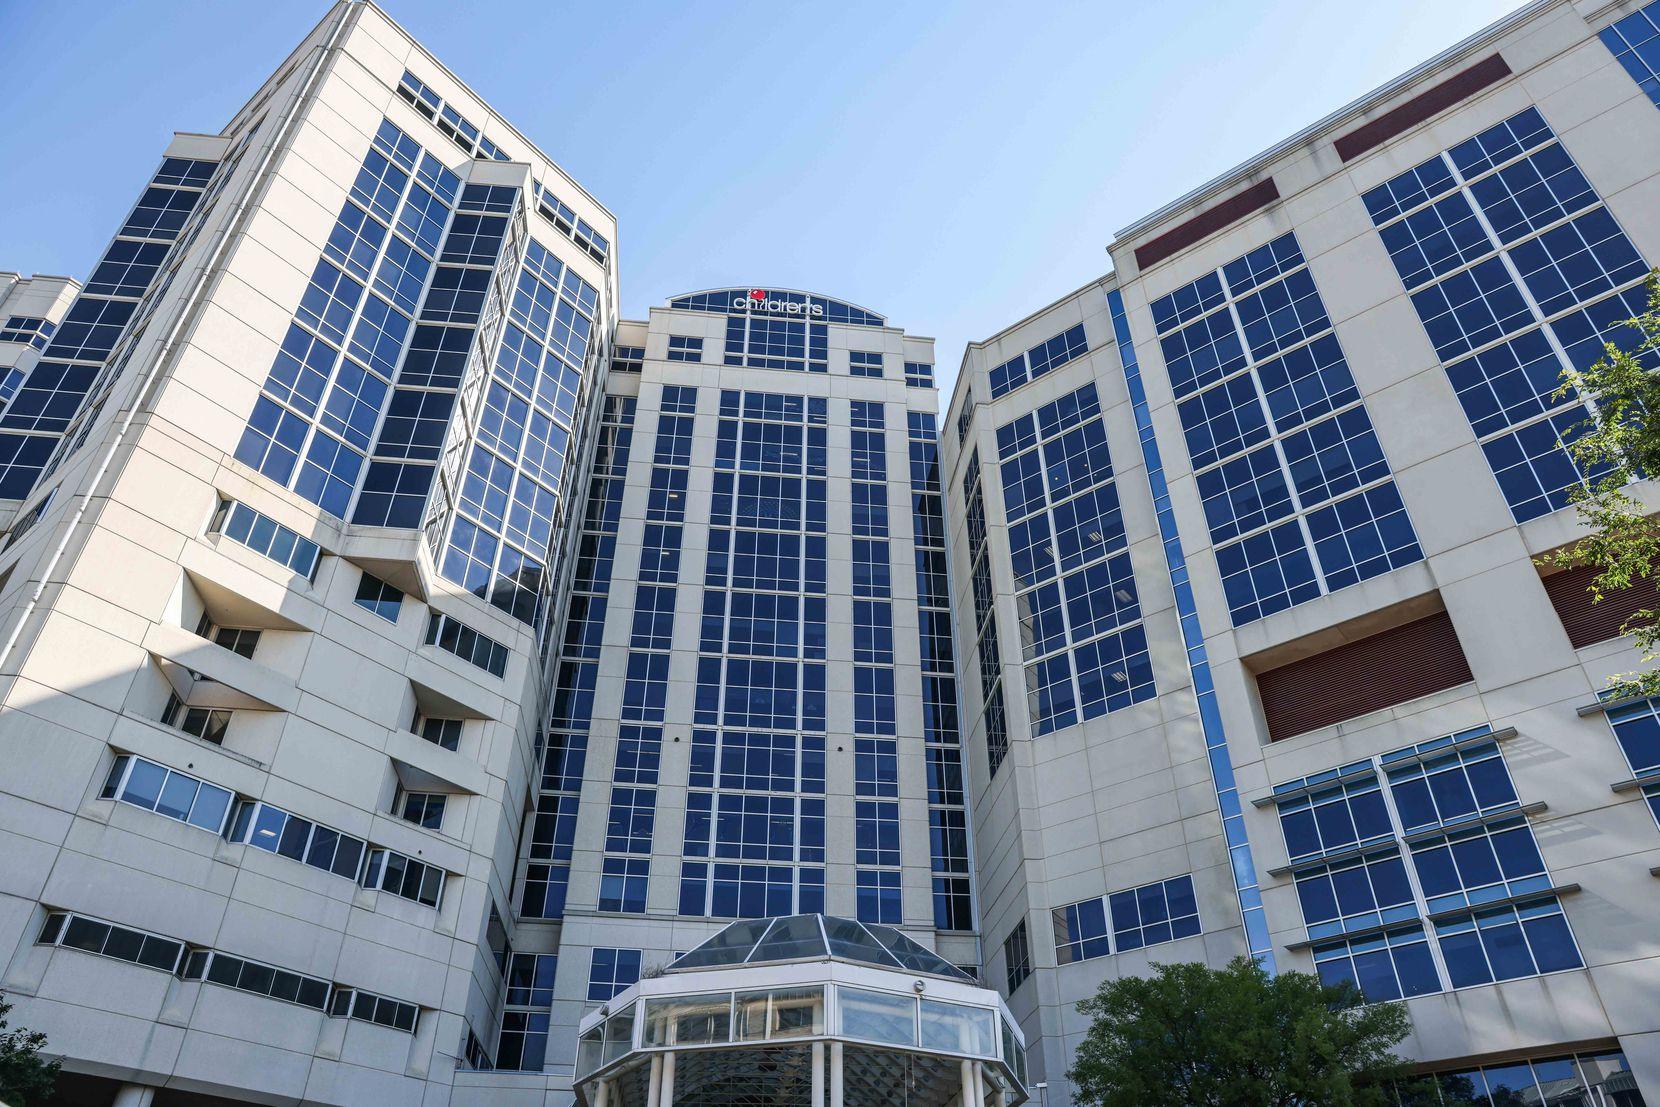 Children's Medical Center in Dallas on Wednesday, June 16, 2021. (Lola Gomez/The Dallas Morning News)